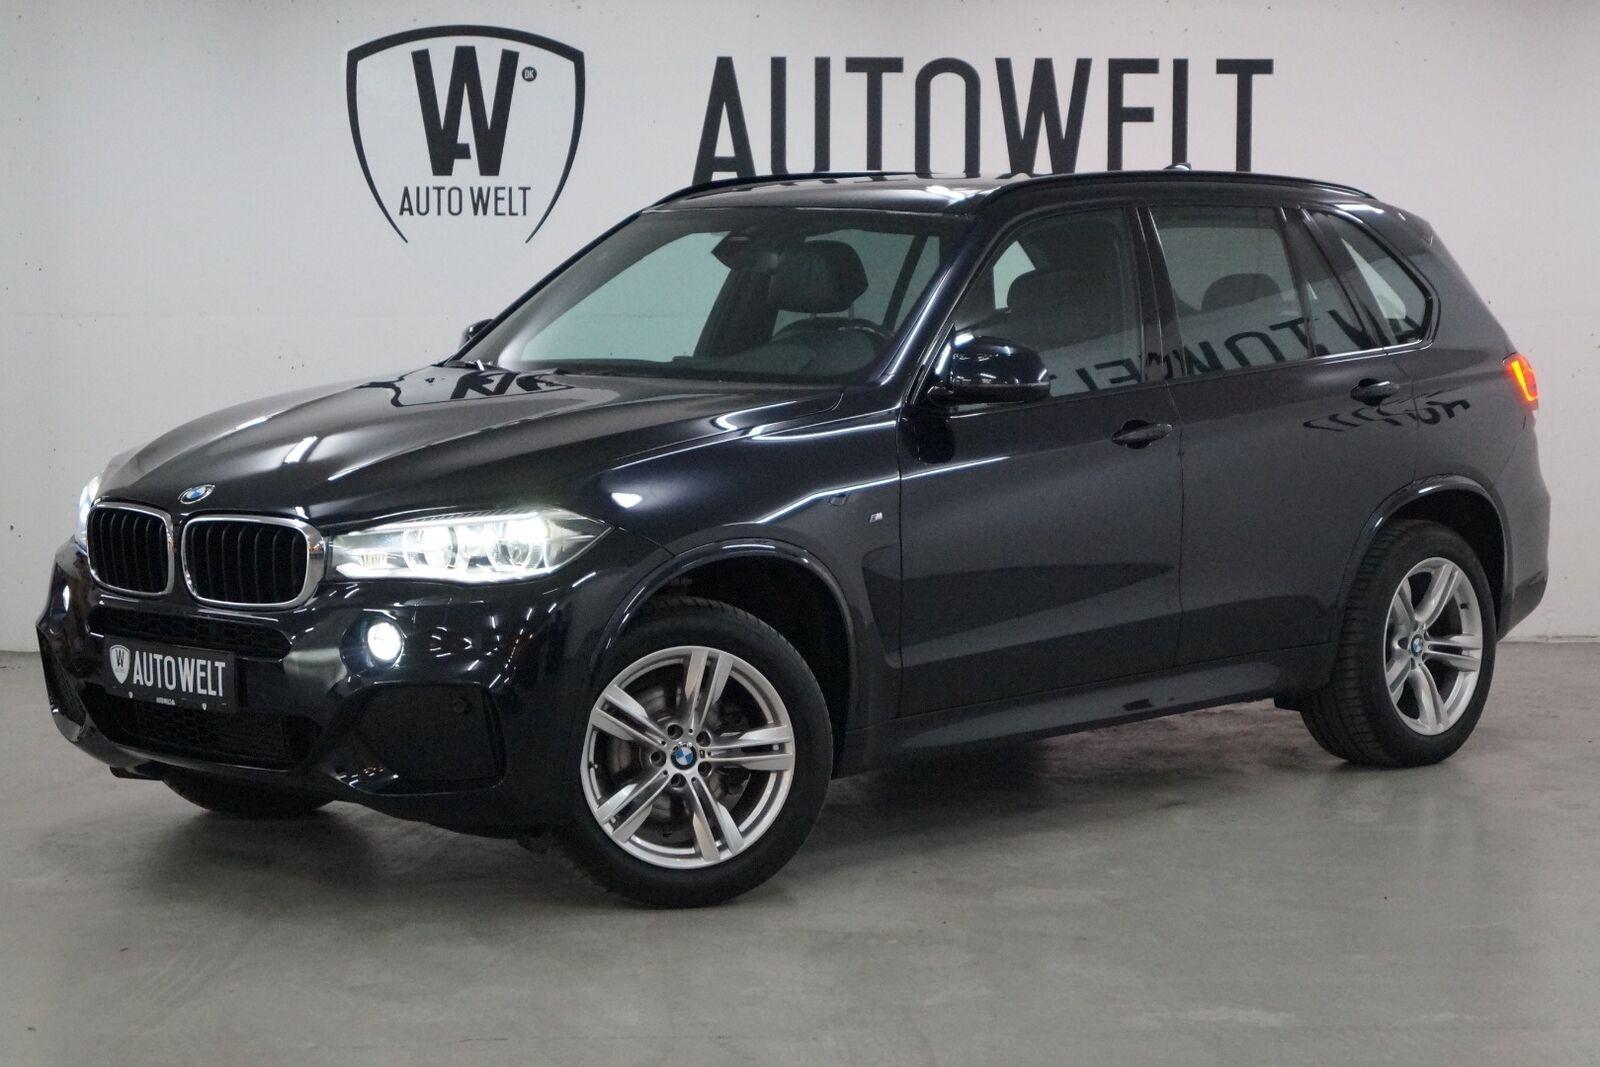 BMW X5 3,0 xDrive30d M-Sport aut. 7prs 5d - 3.795 kr.